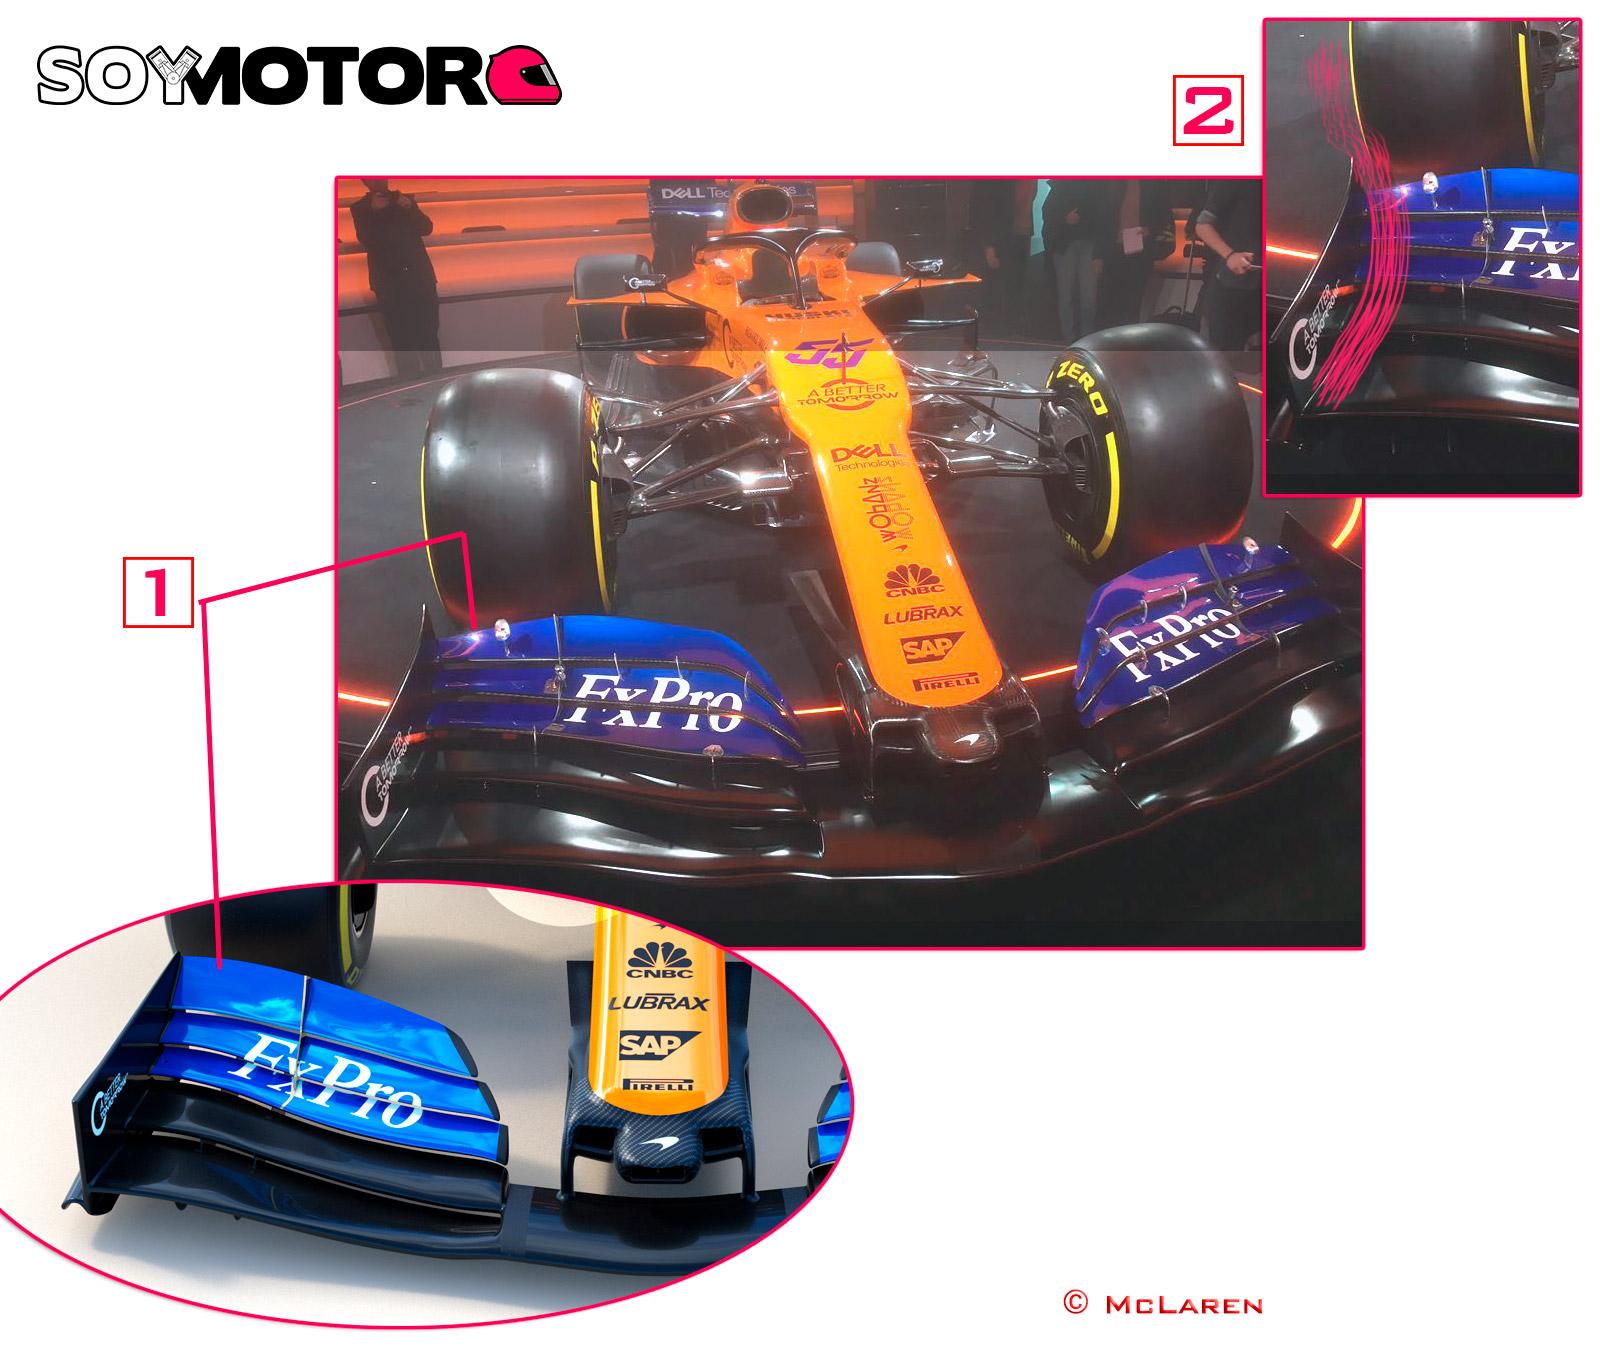 mclaren-ala-delantera-presentacion-soymotor.jpg